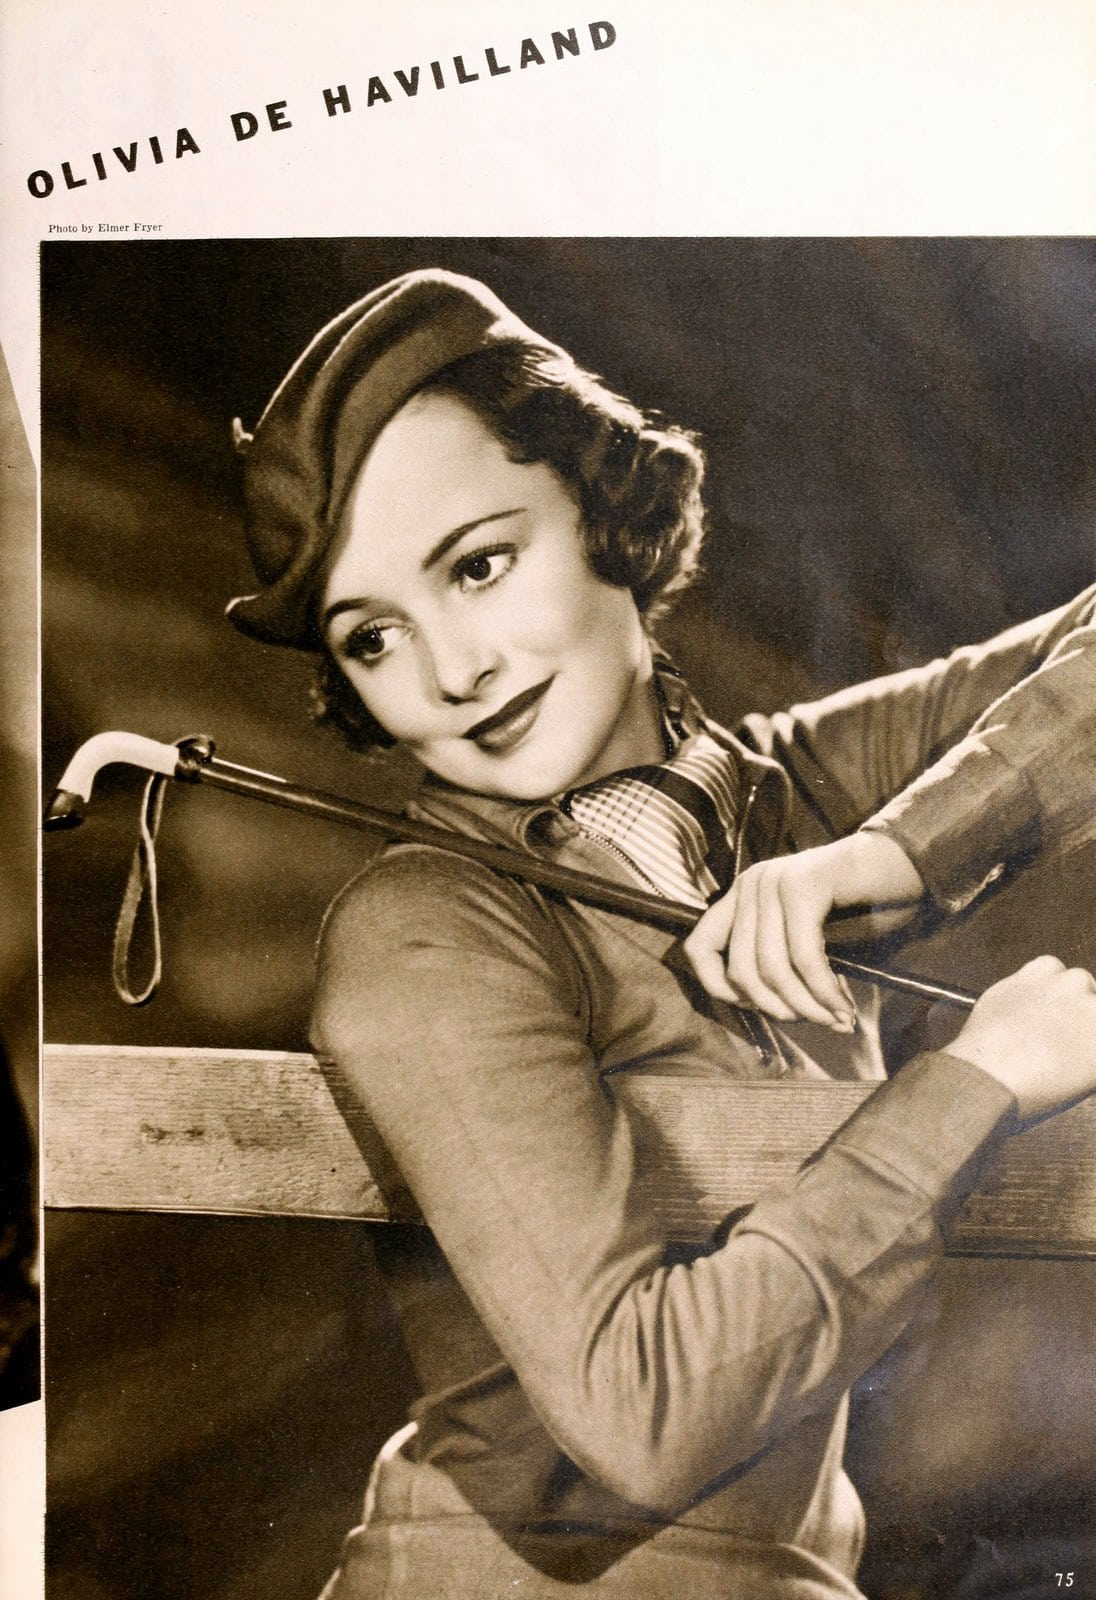 1930s actress Olivia de Havilland